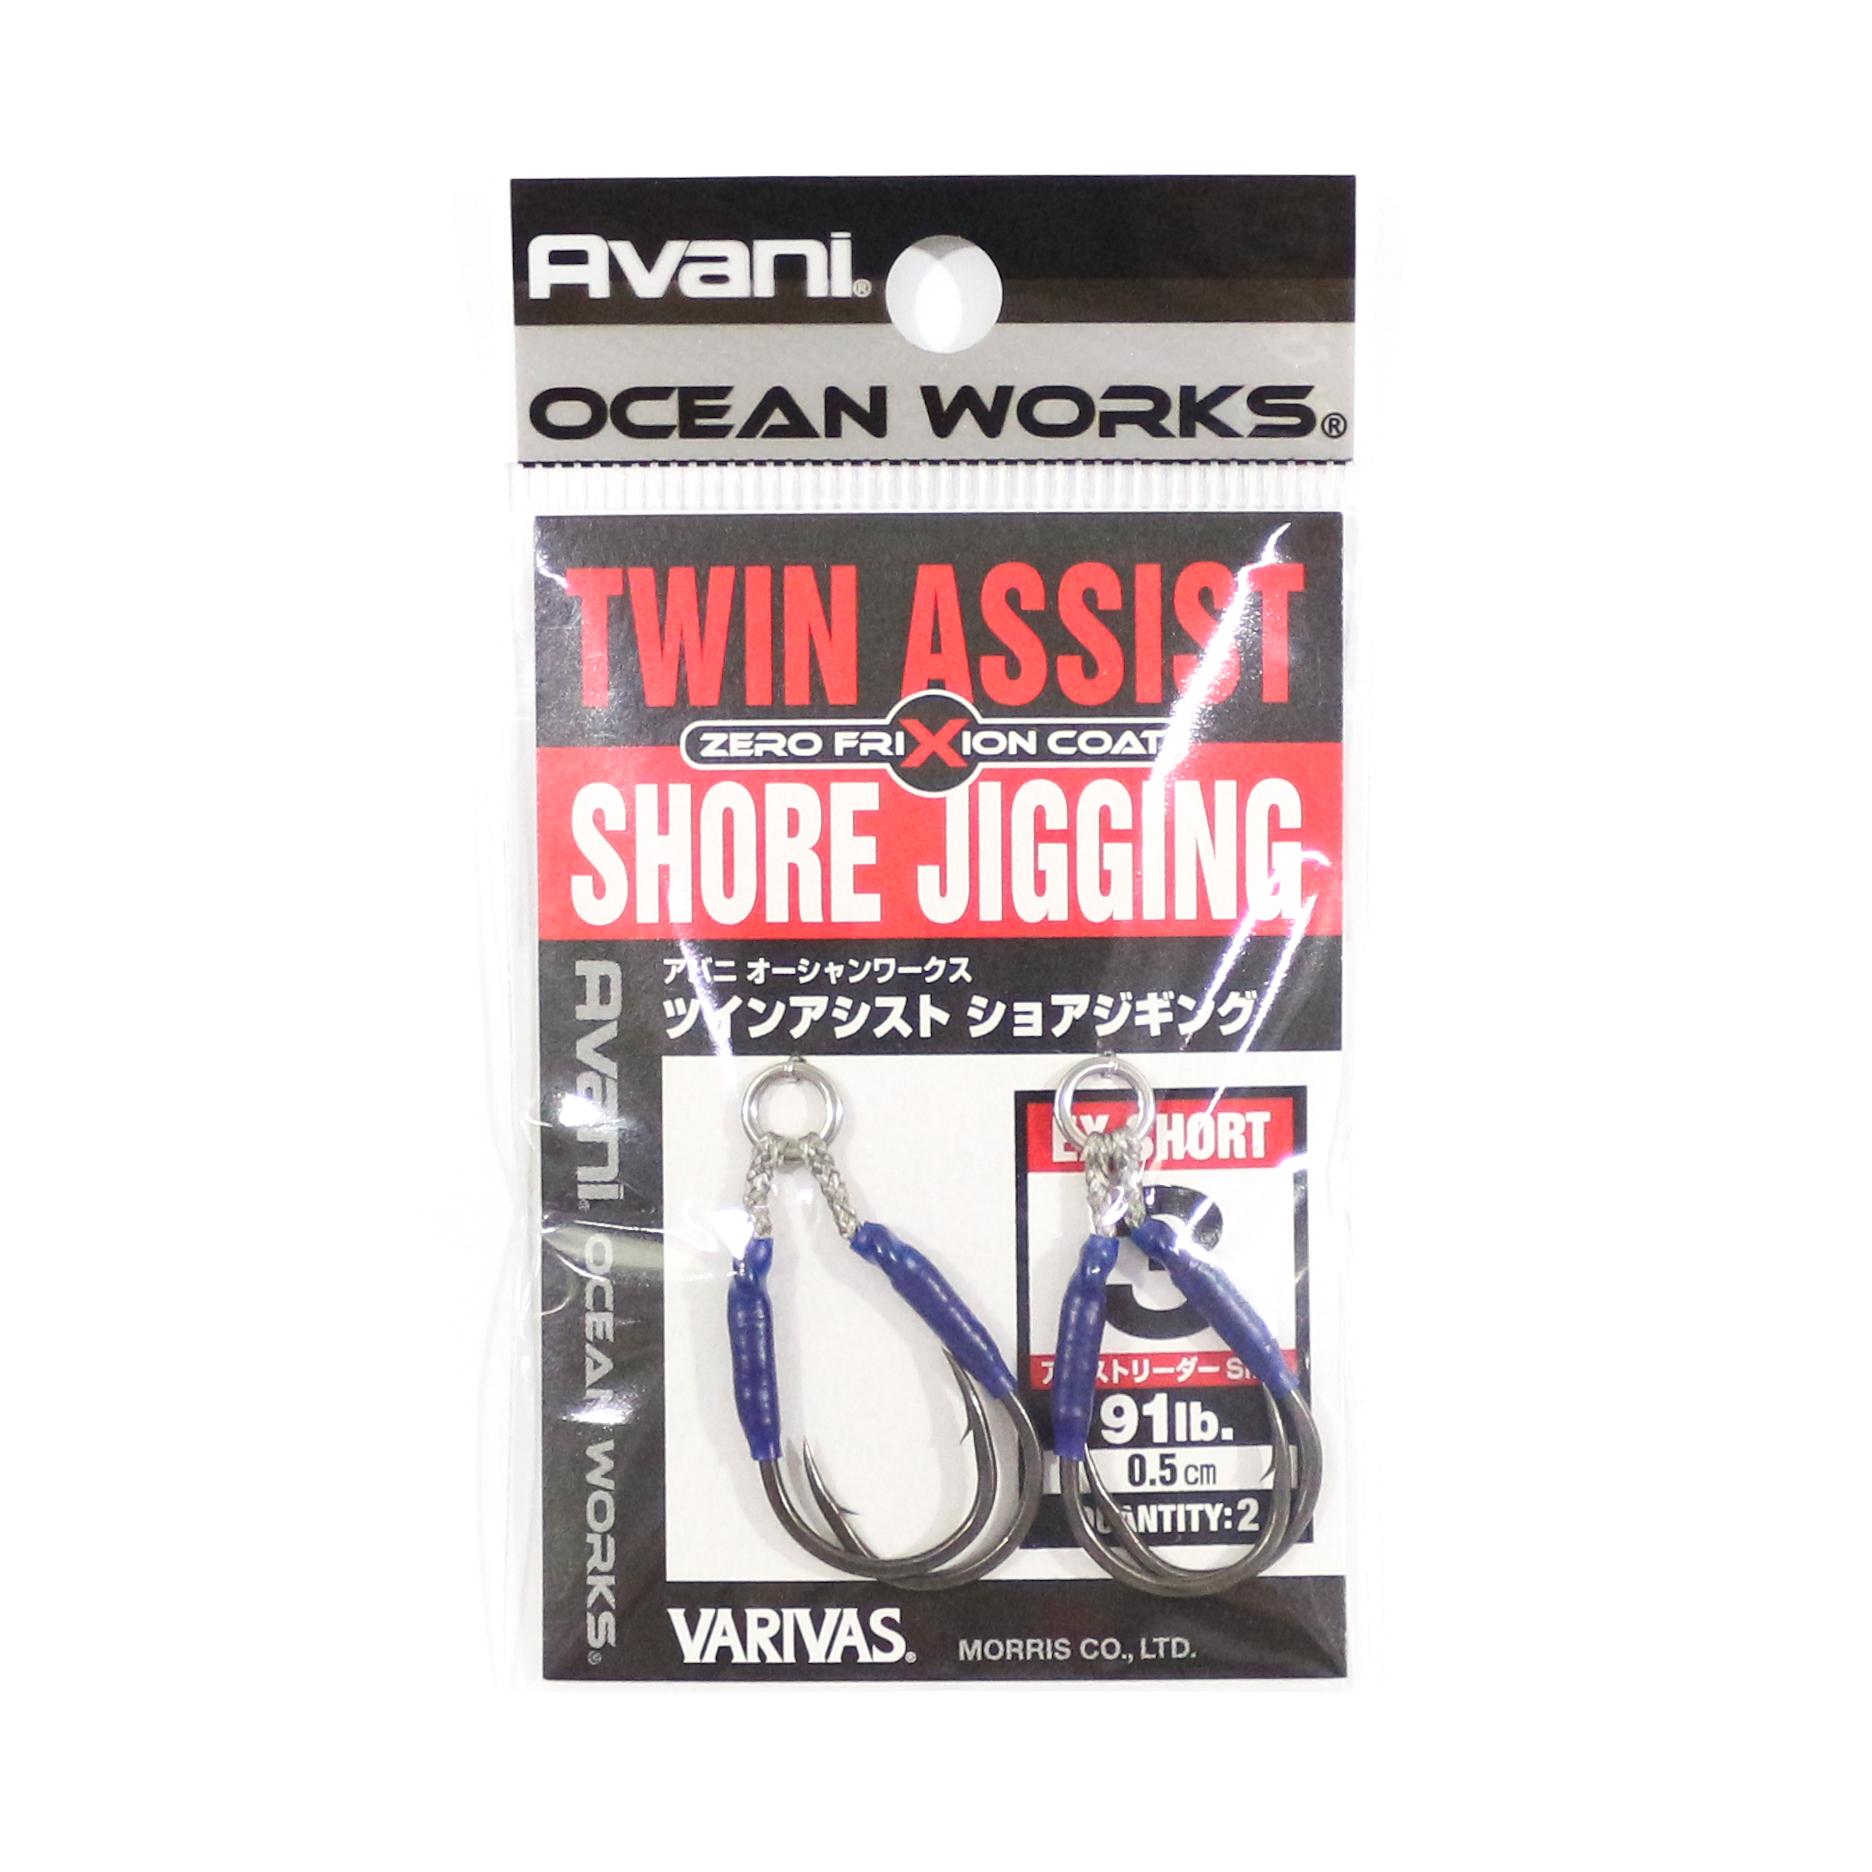 Varivas AH-70 Ocean Works Shore Jigging Hook Exshort Size 3 (4636)